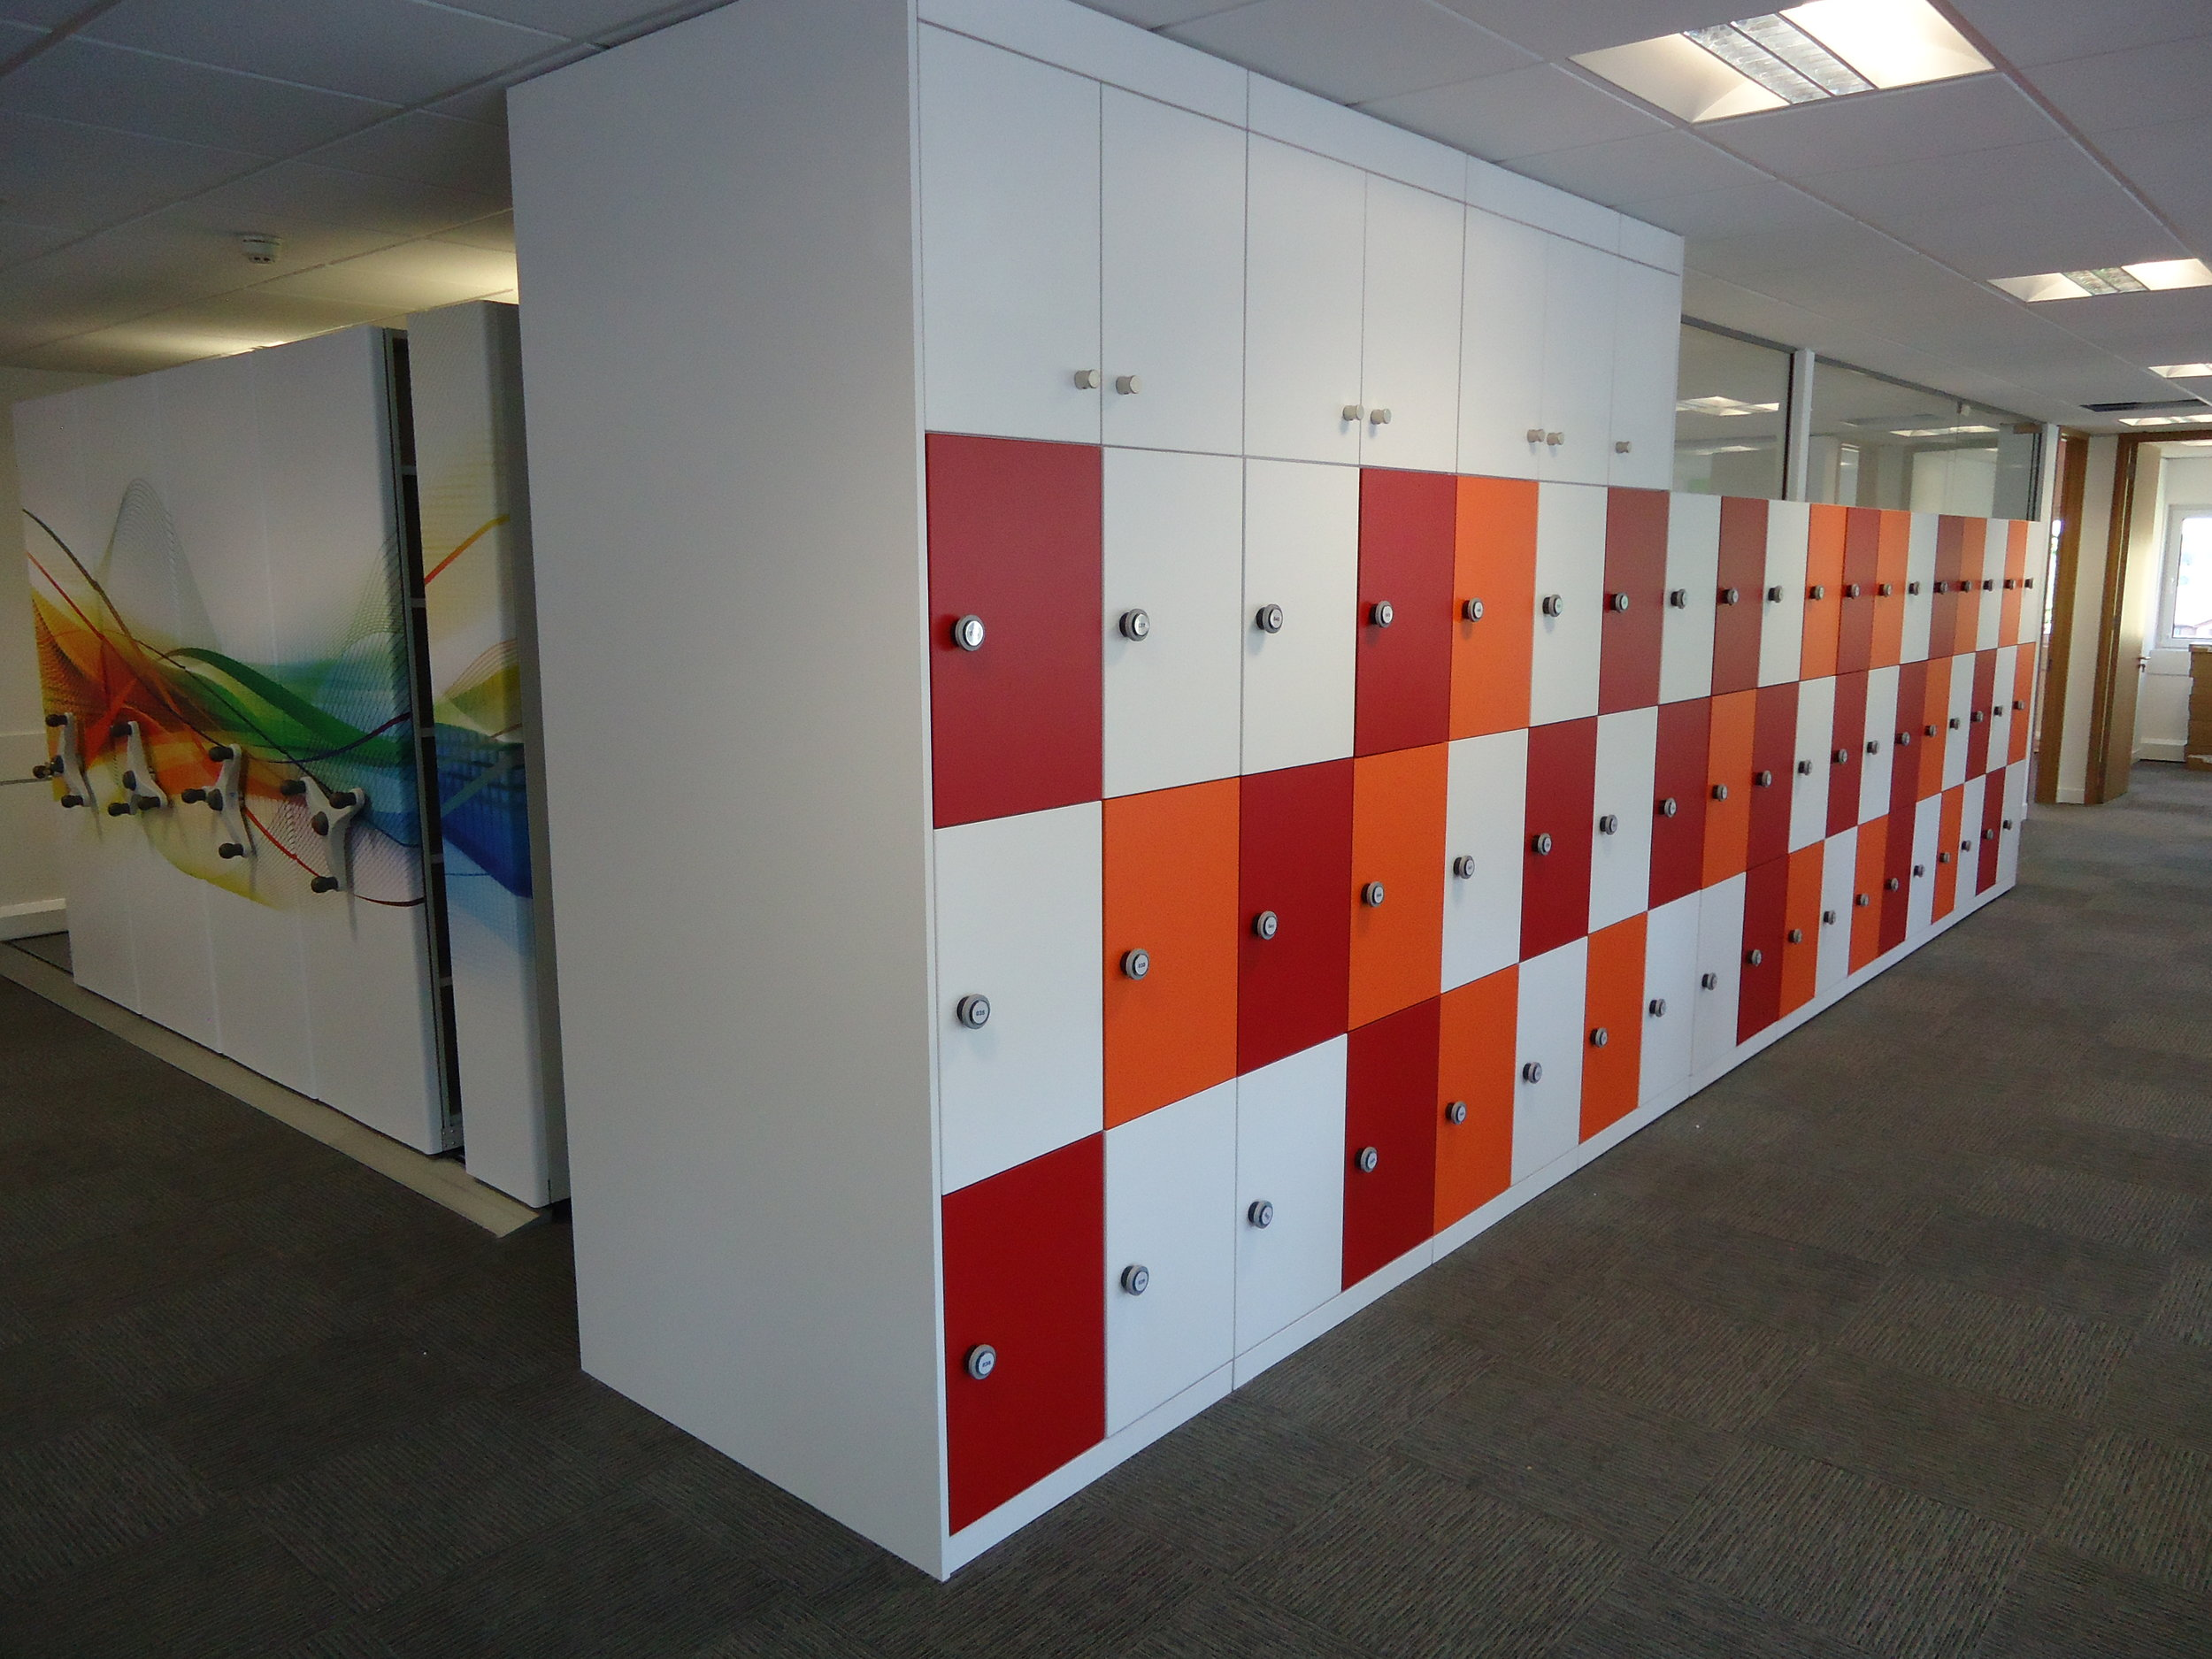 Storagewall Lockers Red and Orange